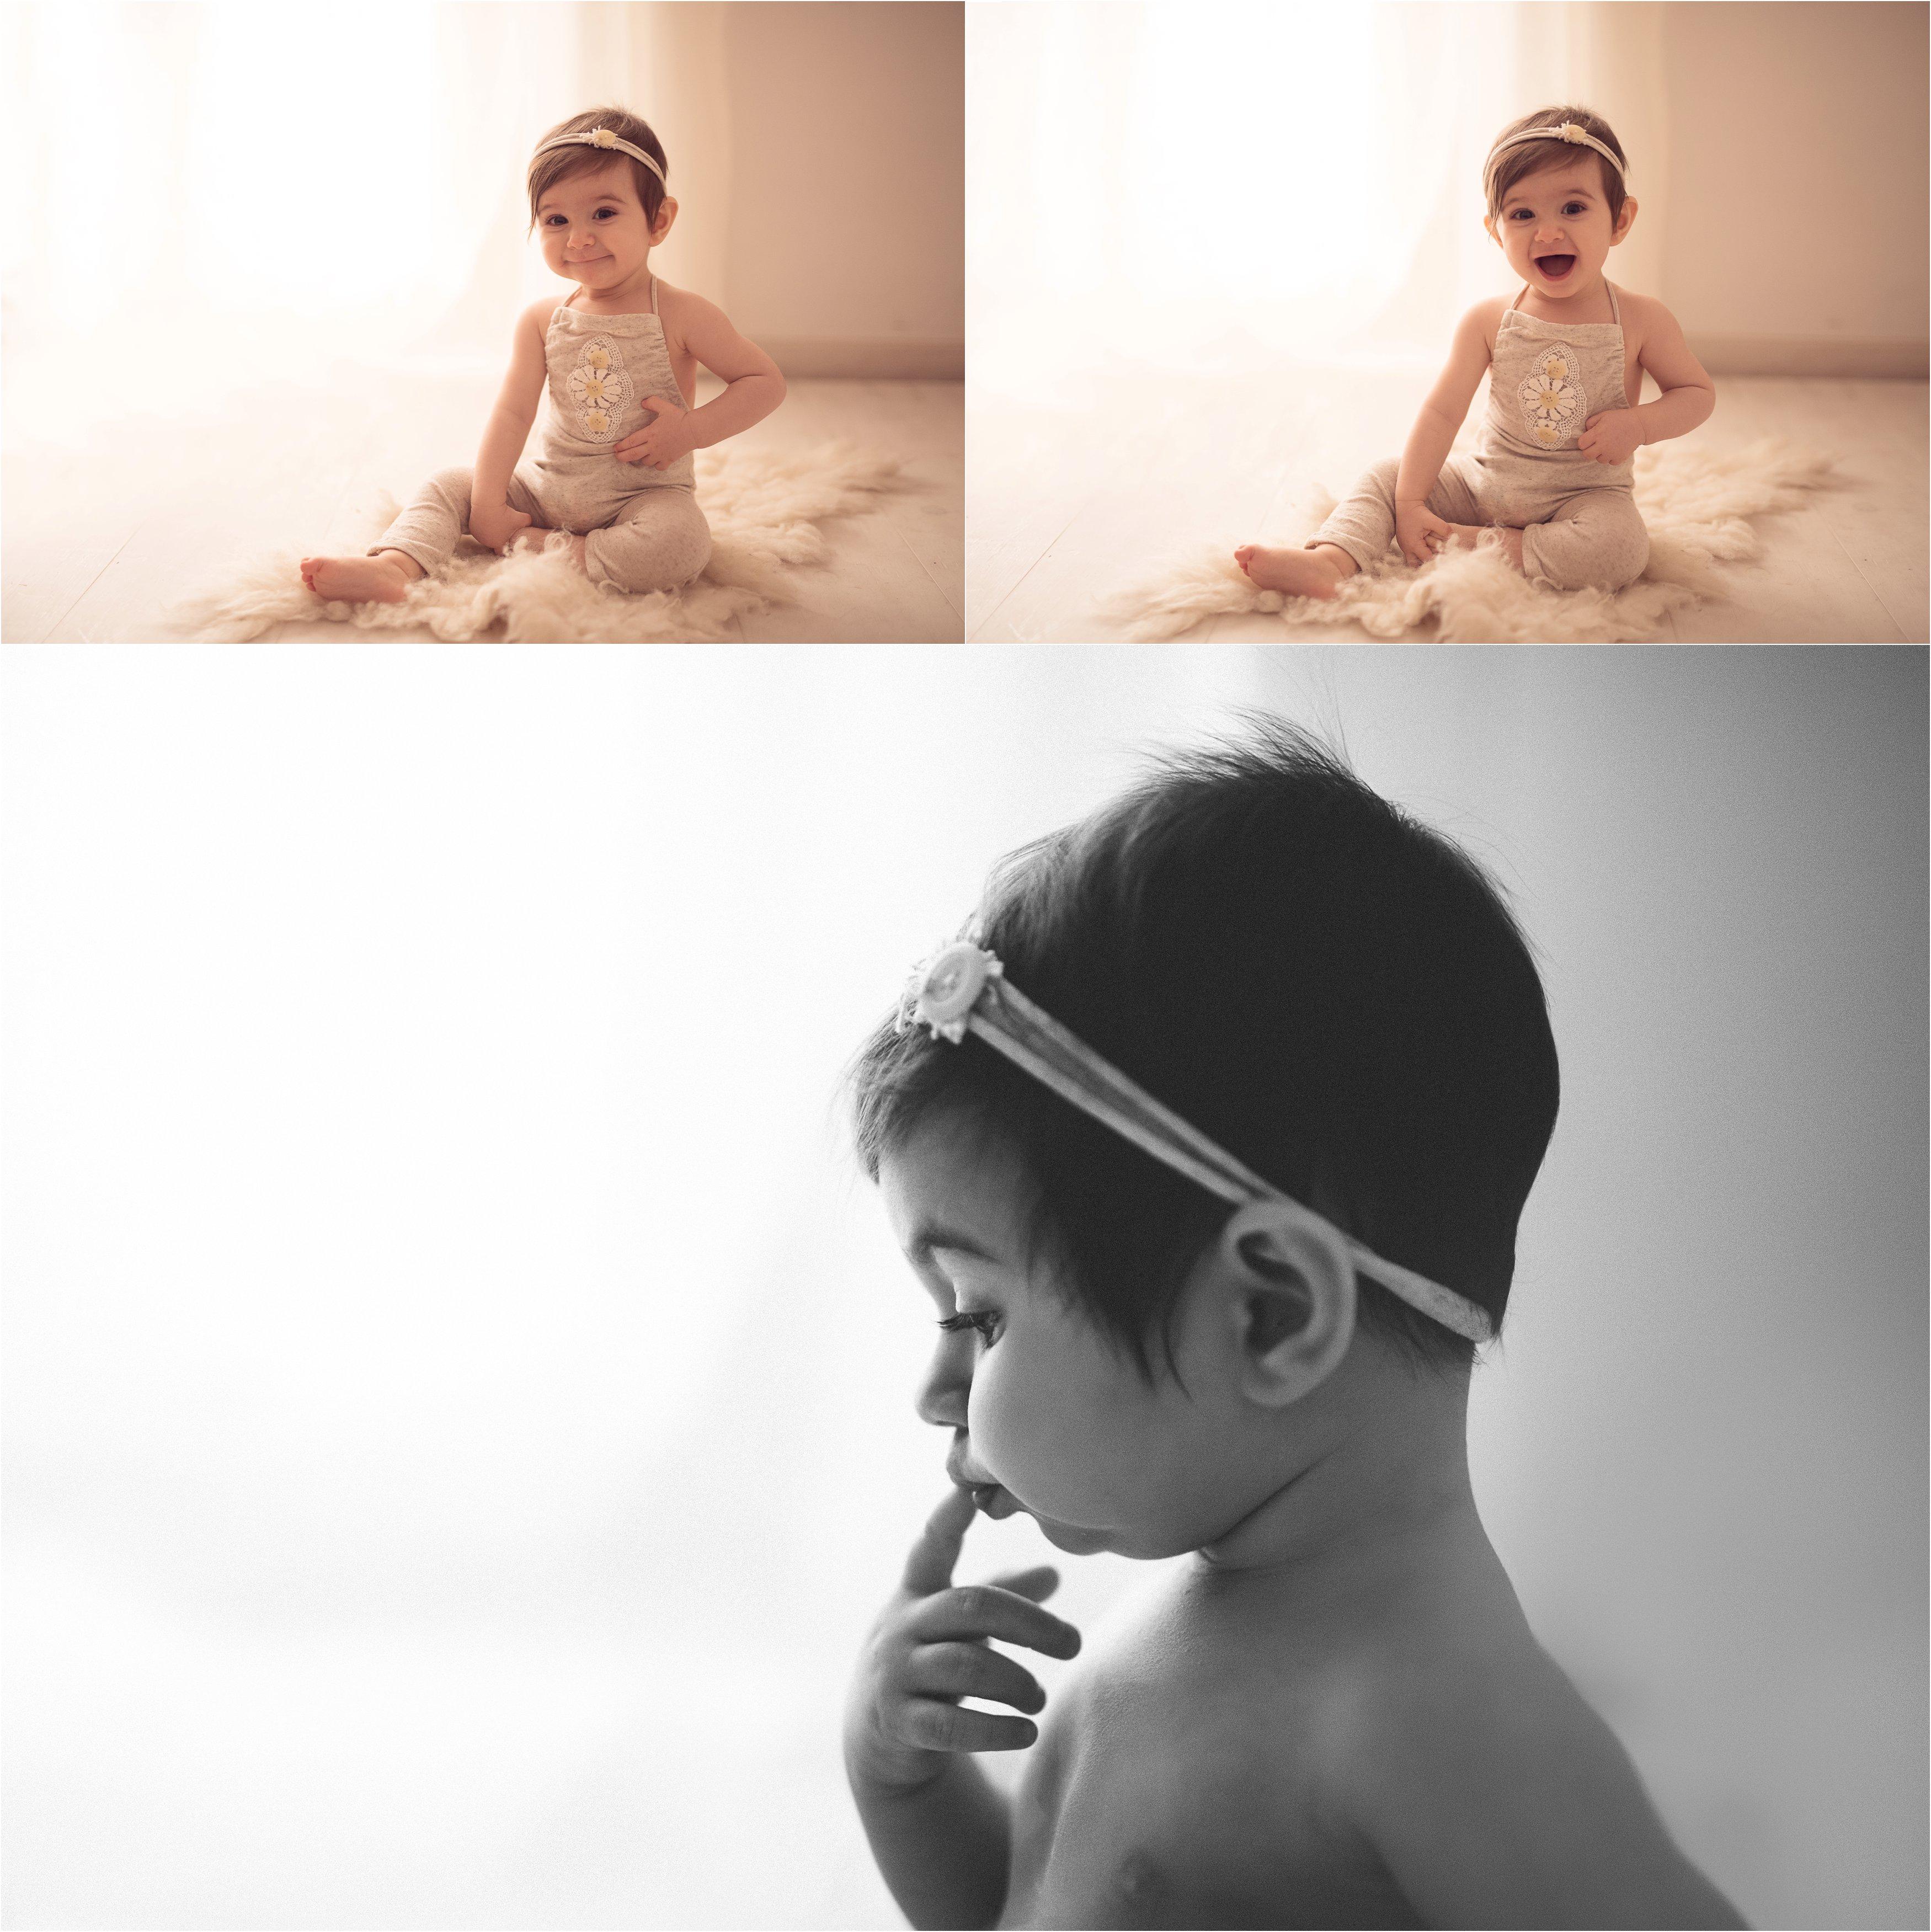 Ginevra_mybabybook_Martyna Ball-19_fotografo bambini roma.jpg